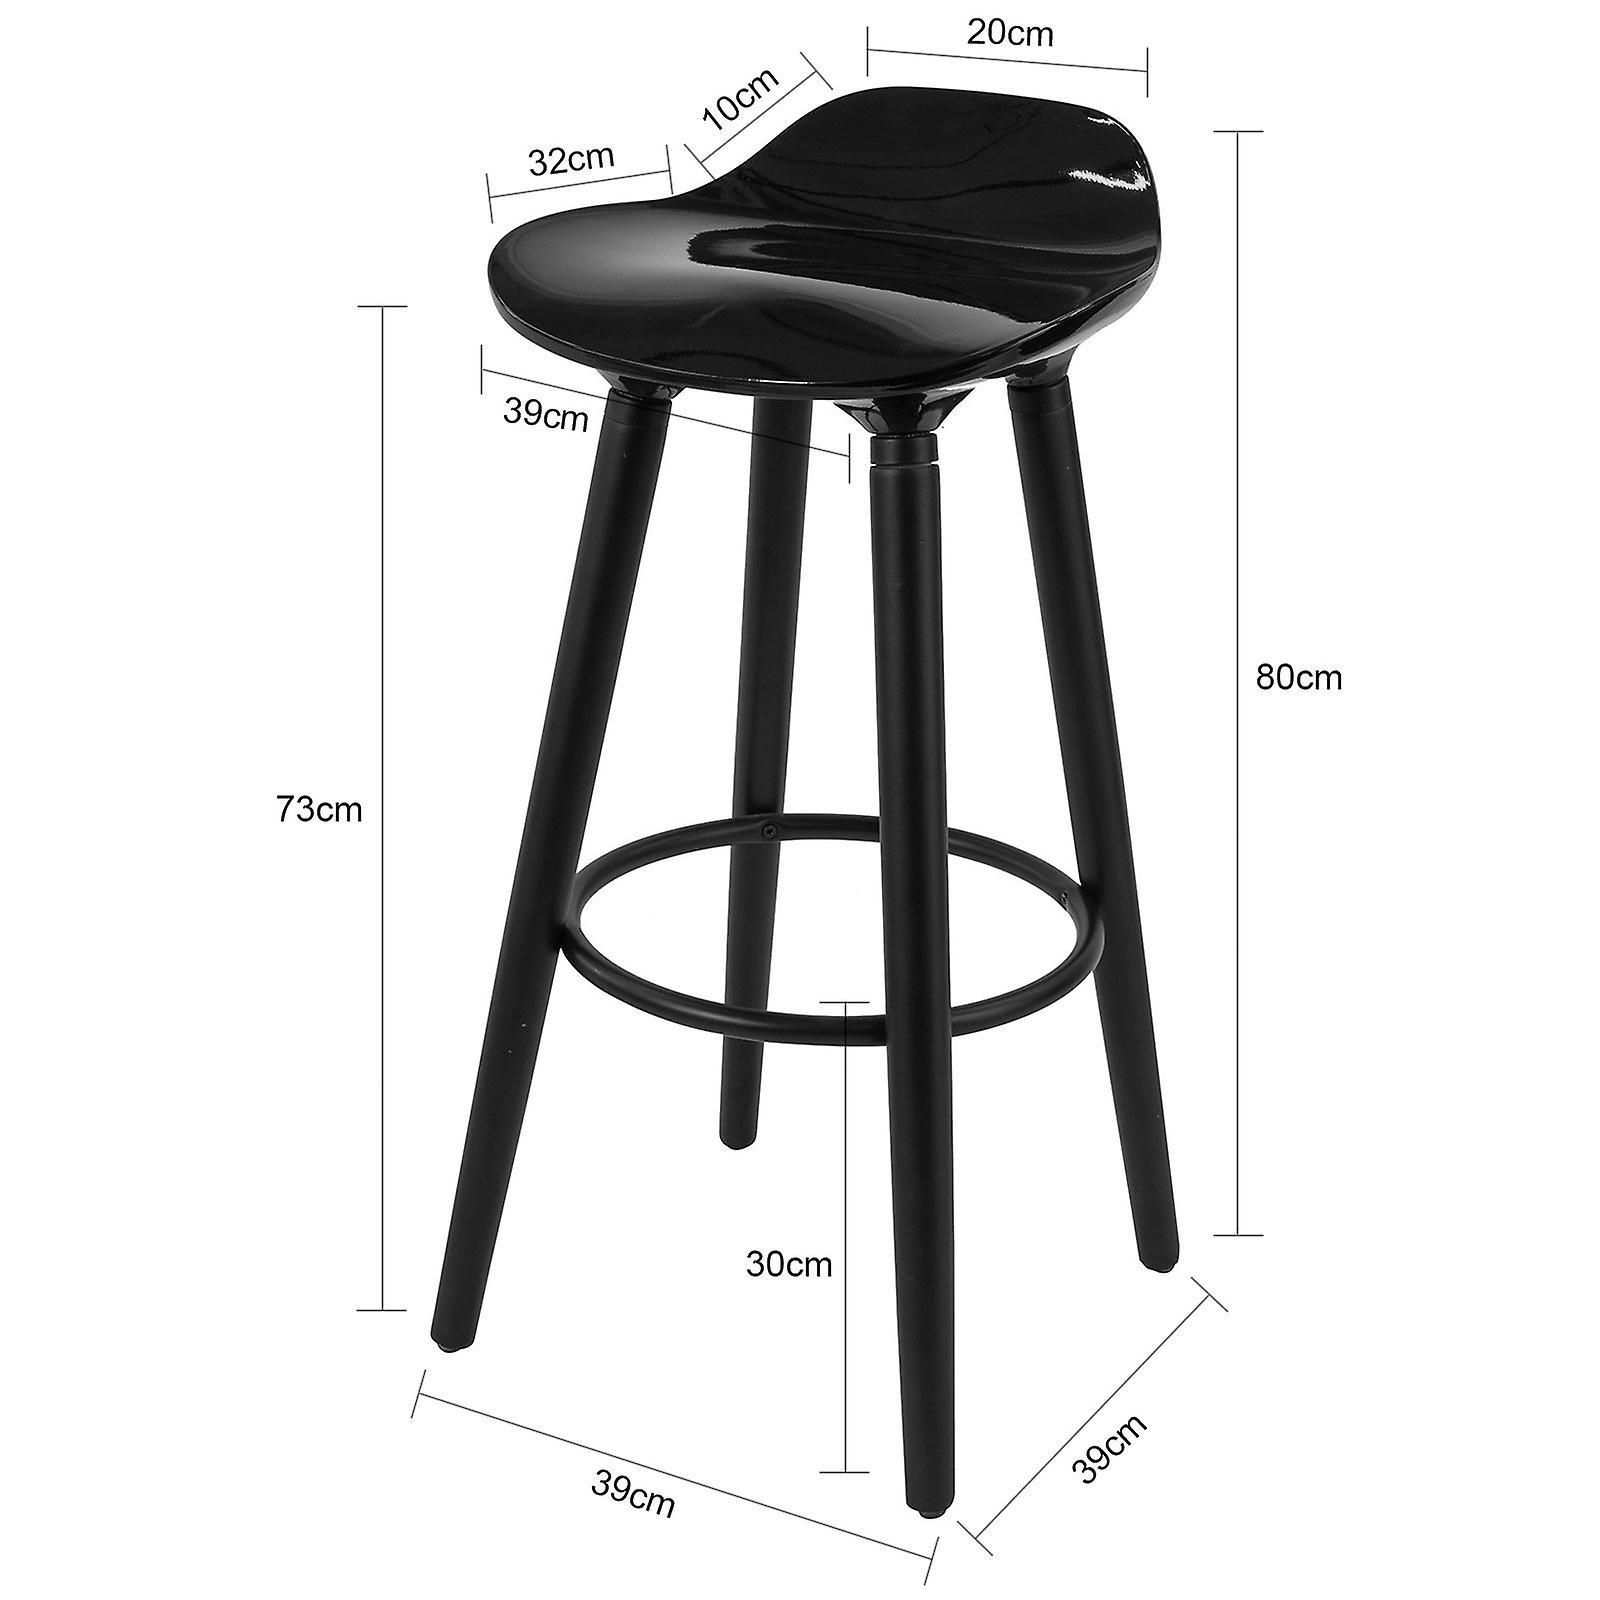 SoBuy FST34-HEI, Bar Stool Kitchen Breakfast Barstool avec ABS Plastic Seat & Beech wood Legs, Noir